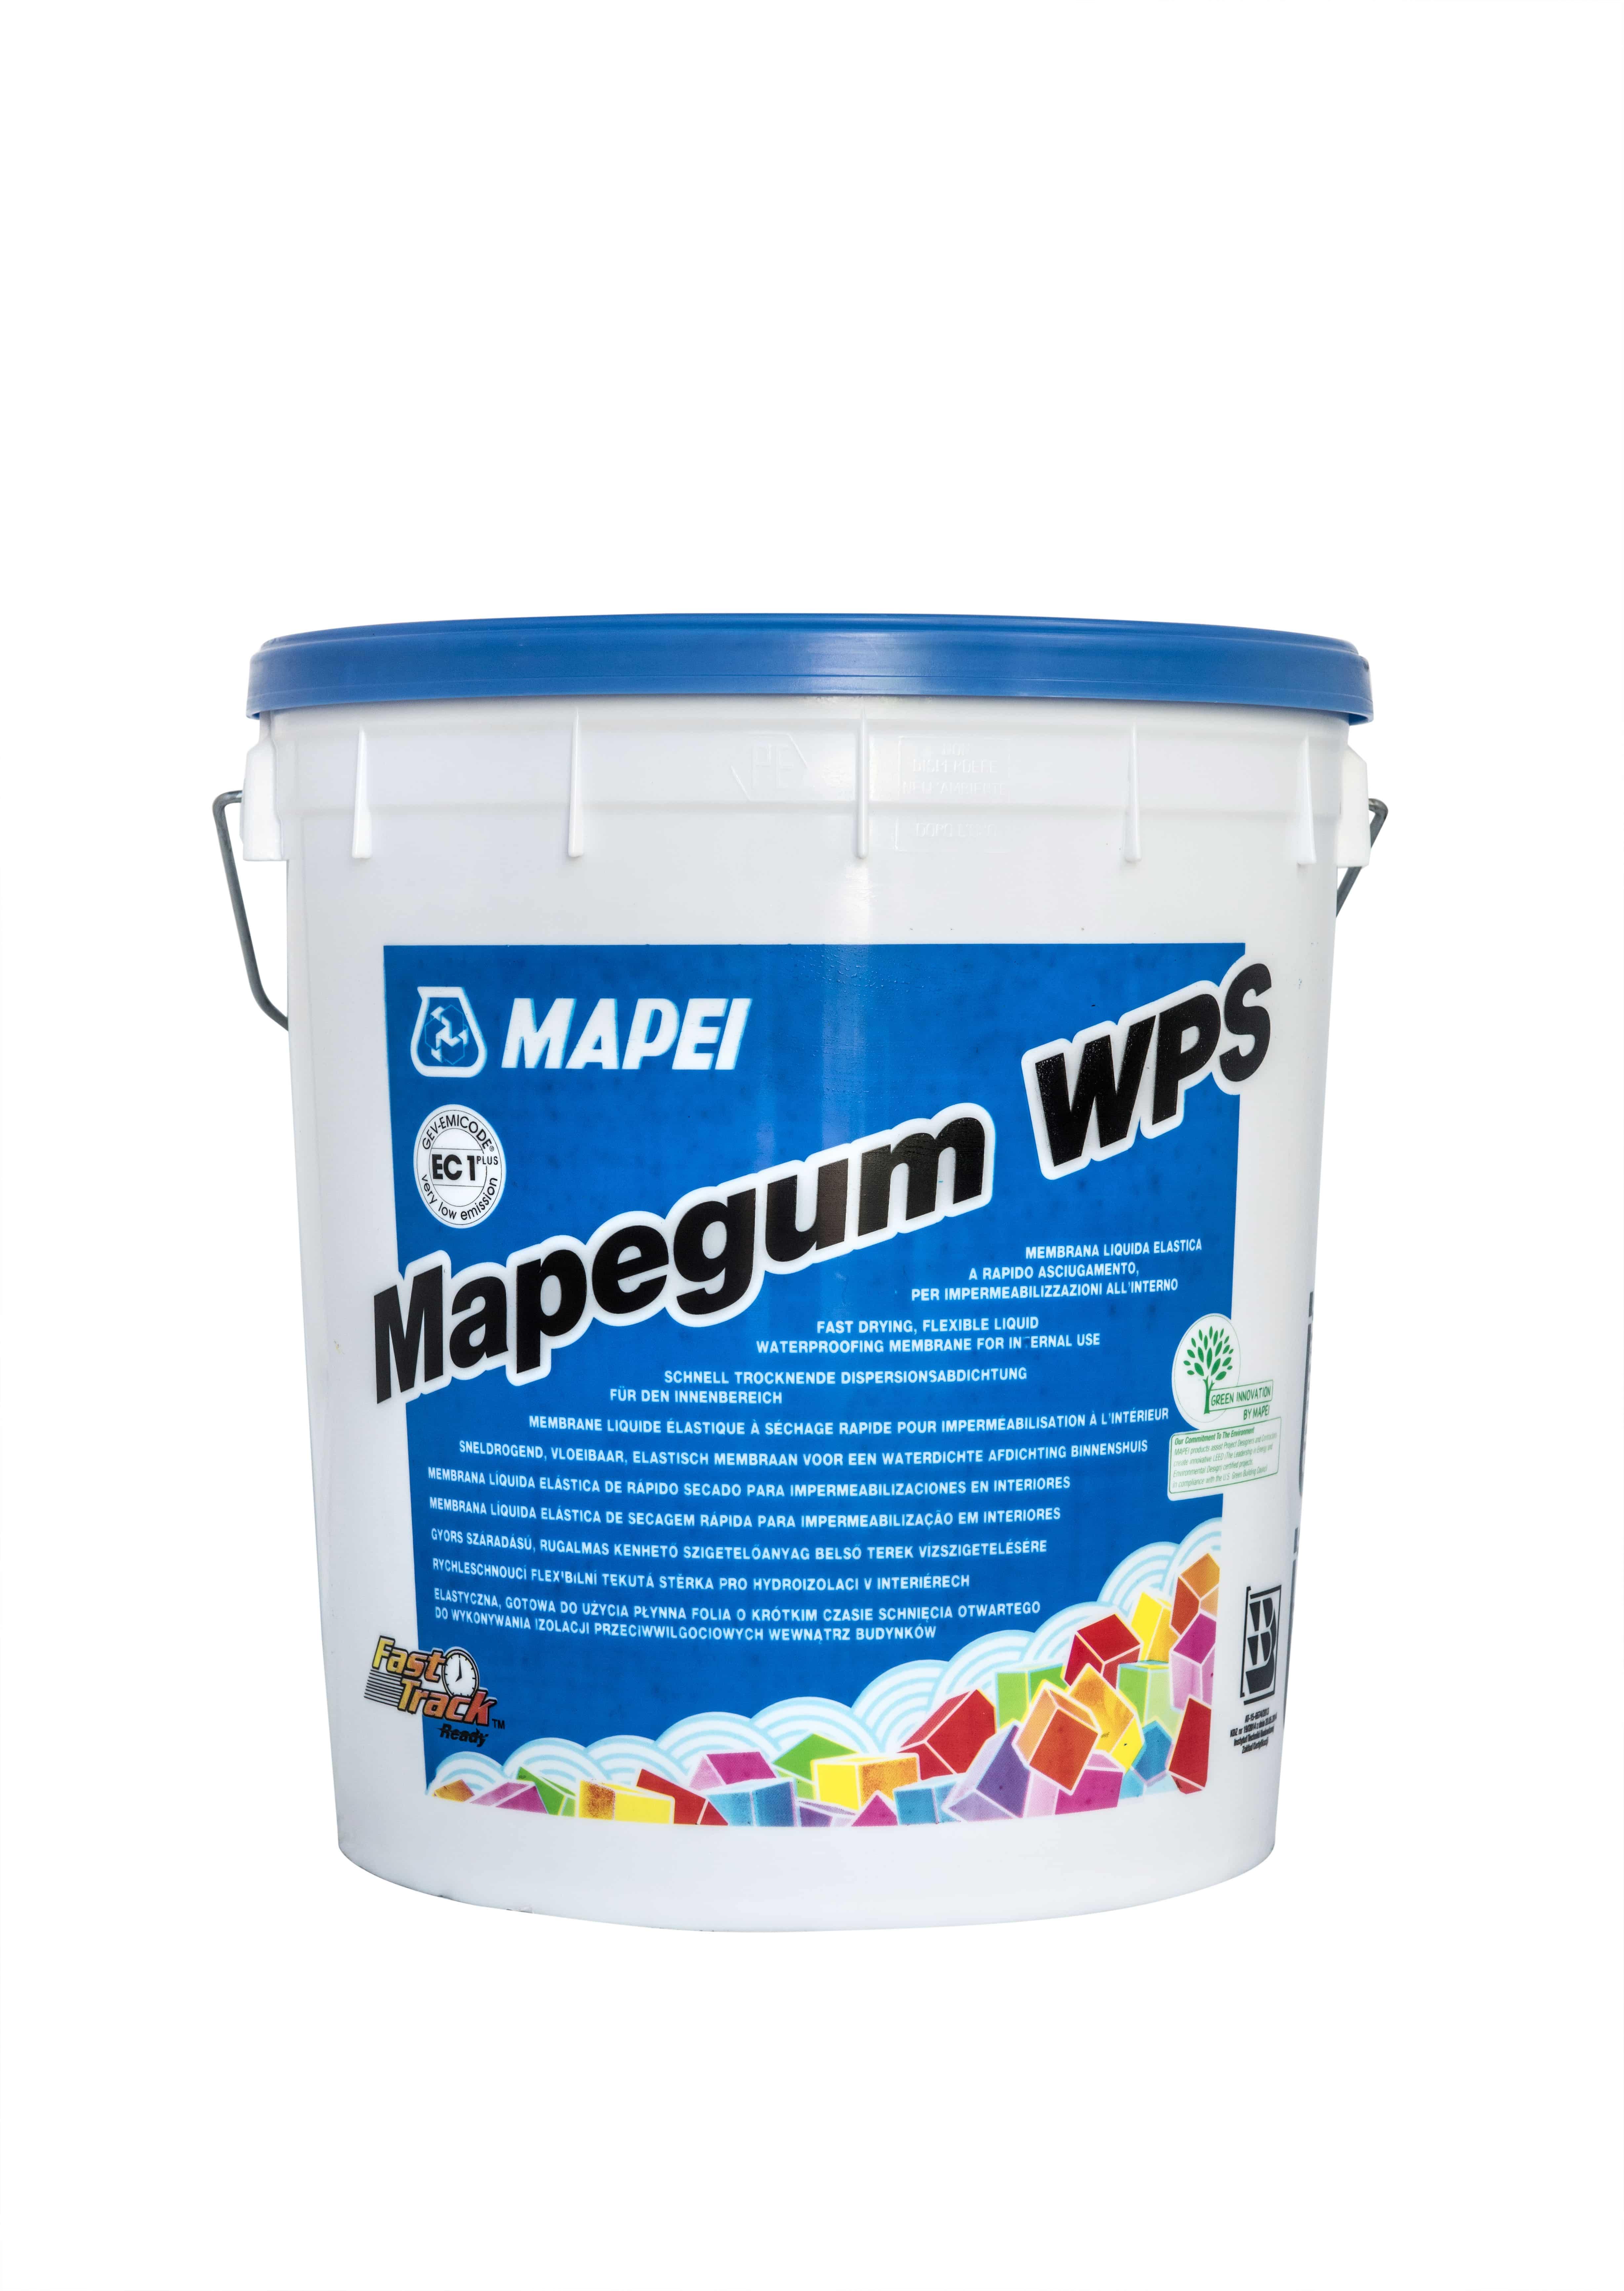 Mapei Waterproofing Membrane : Mapei mapegum wps tilers trade centre